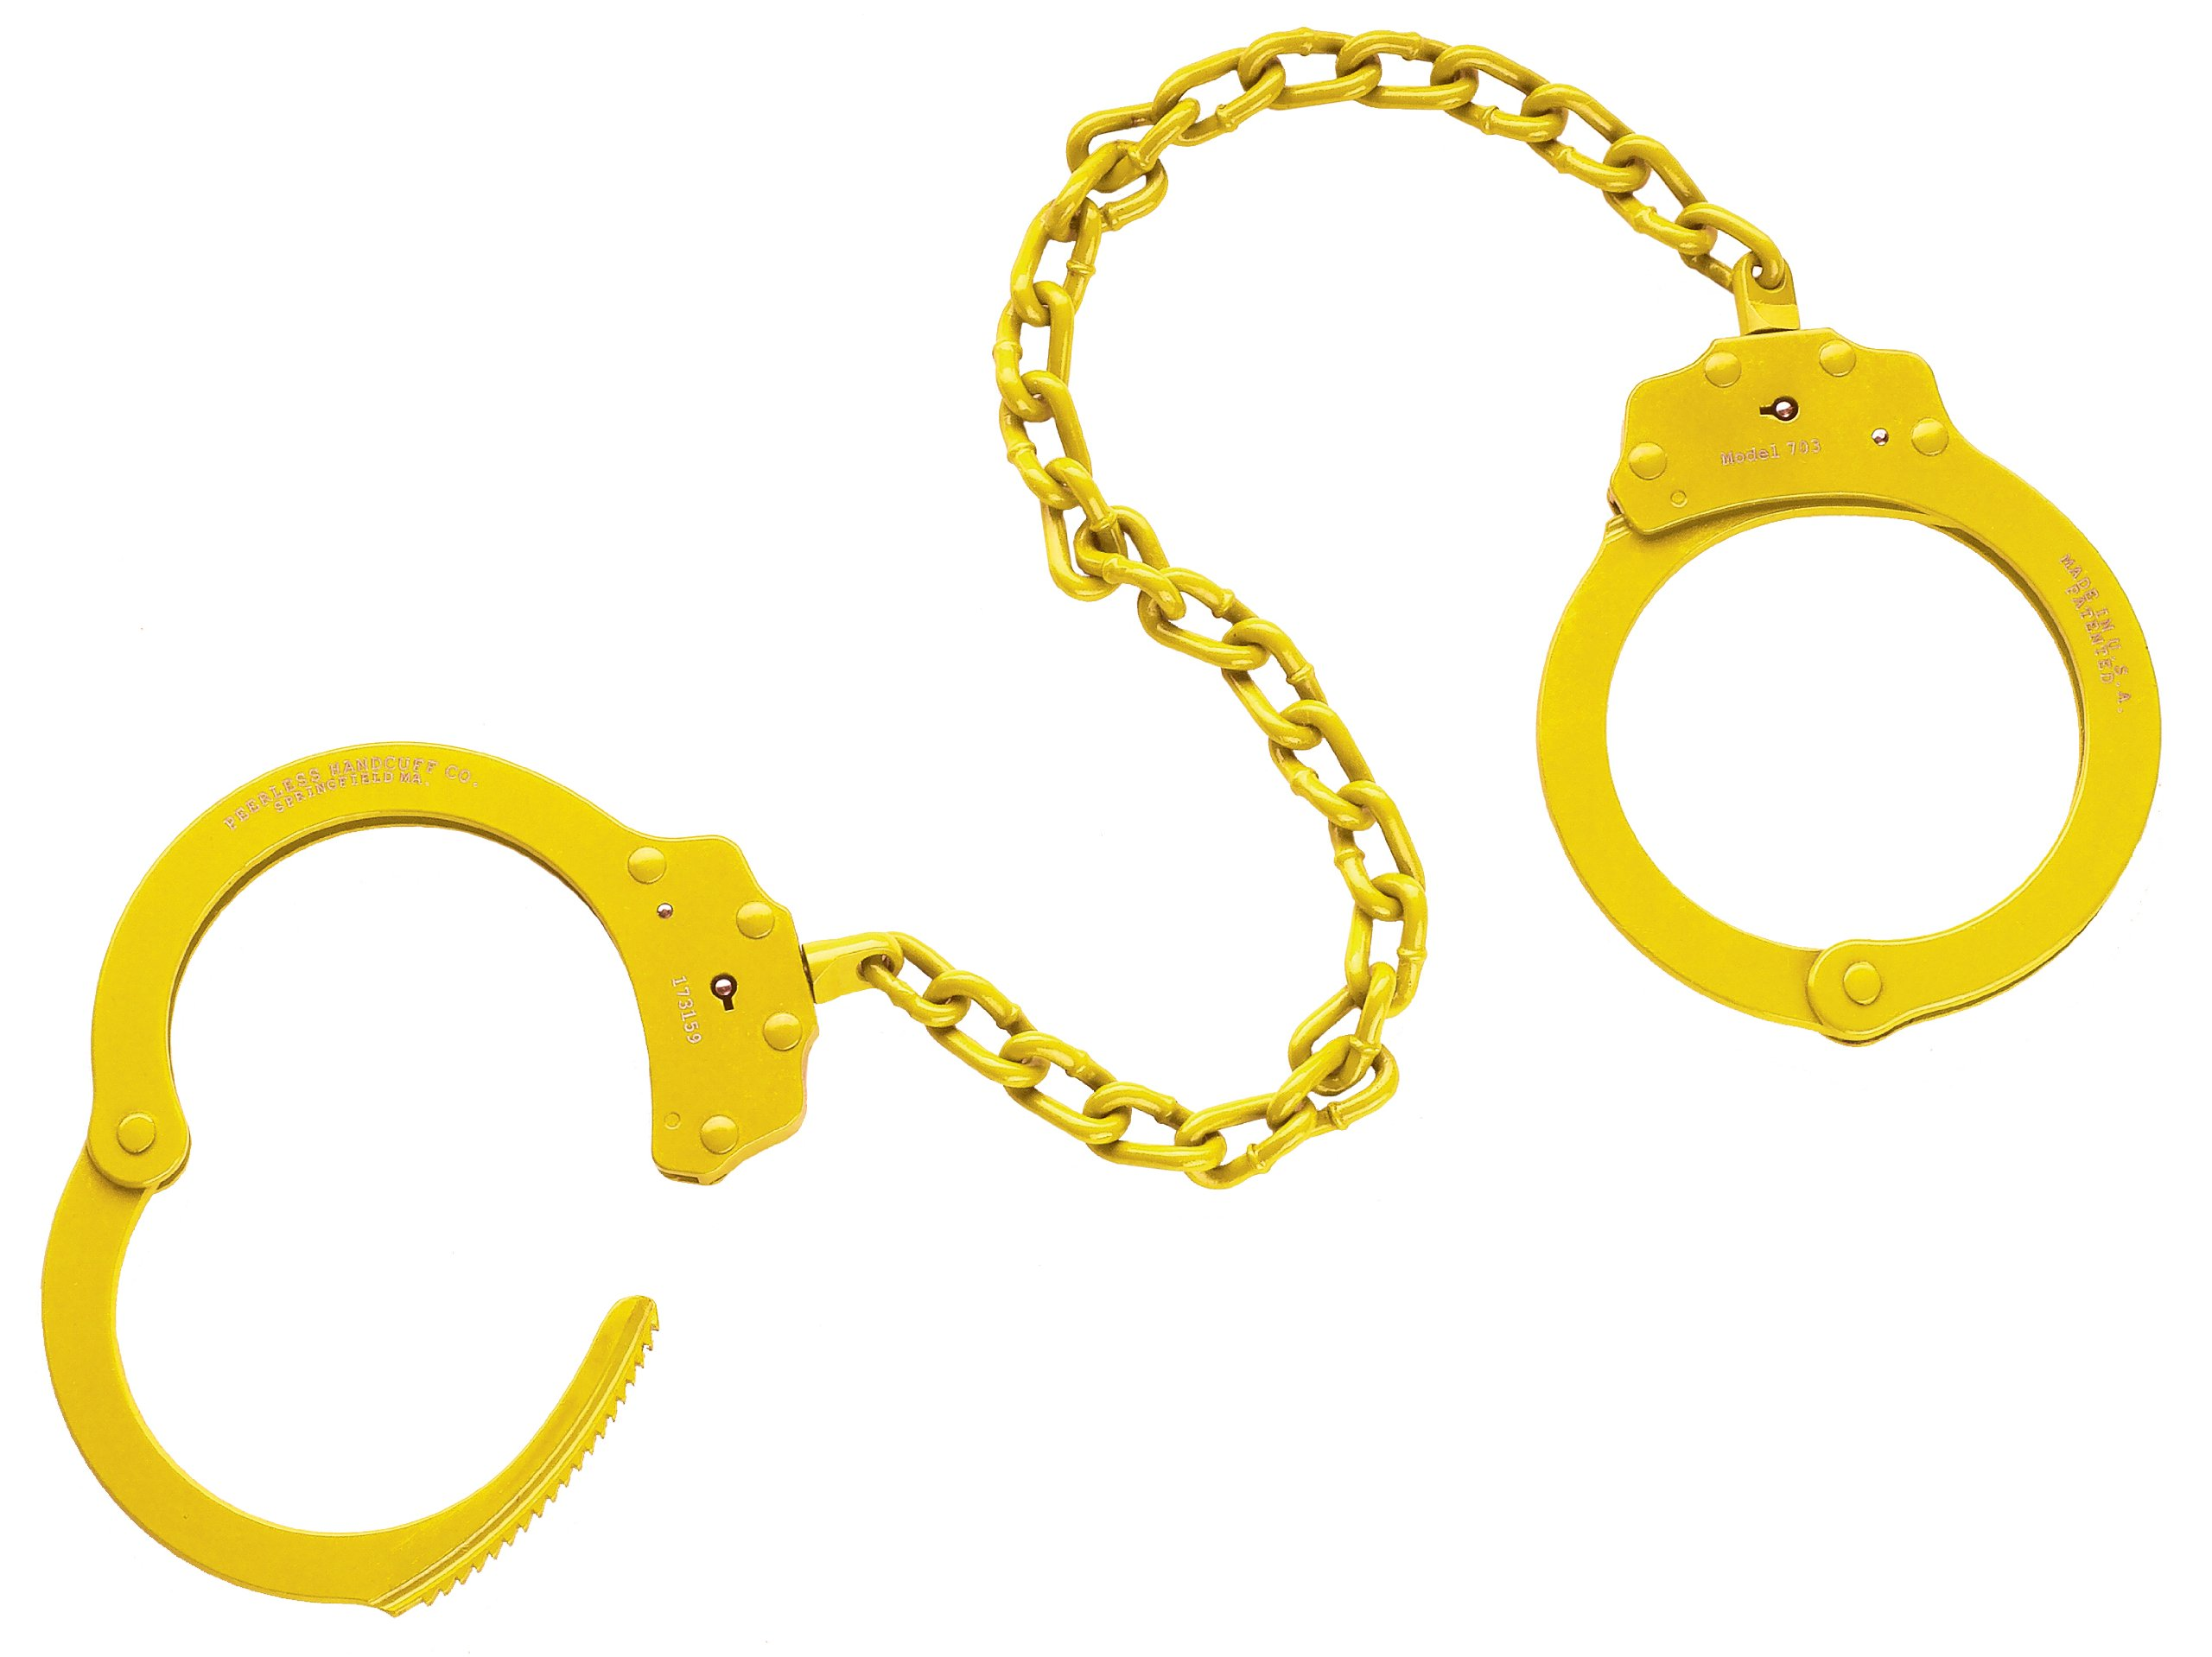 Peerless Handcuff Company 755B Oversize Leg Iron, Yellow by Peerless Handcuffs